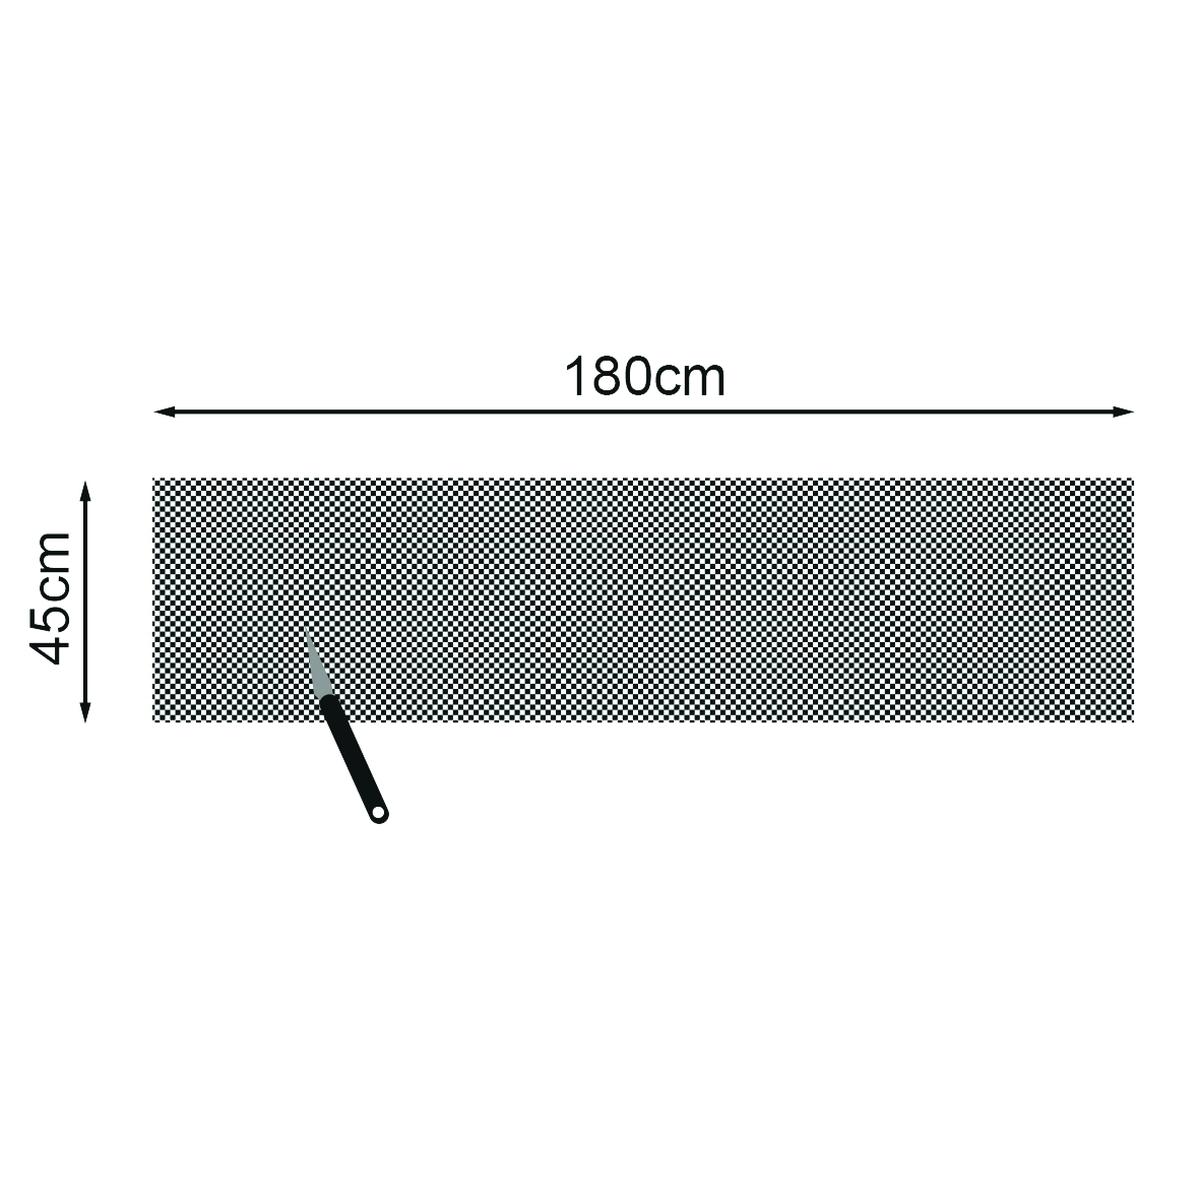 Anti-Rutschmatte schwarz 180x45 cm 3mm